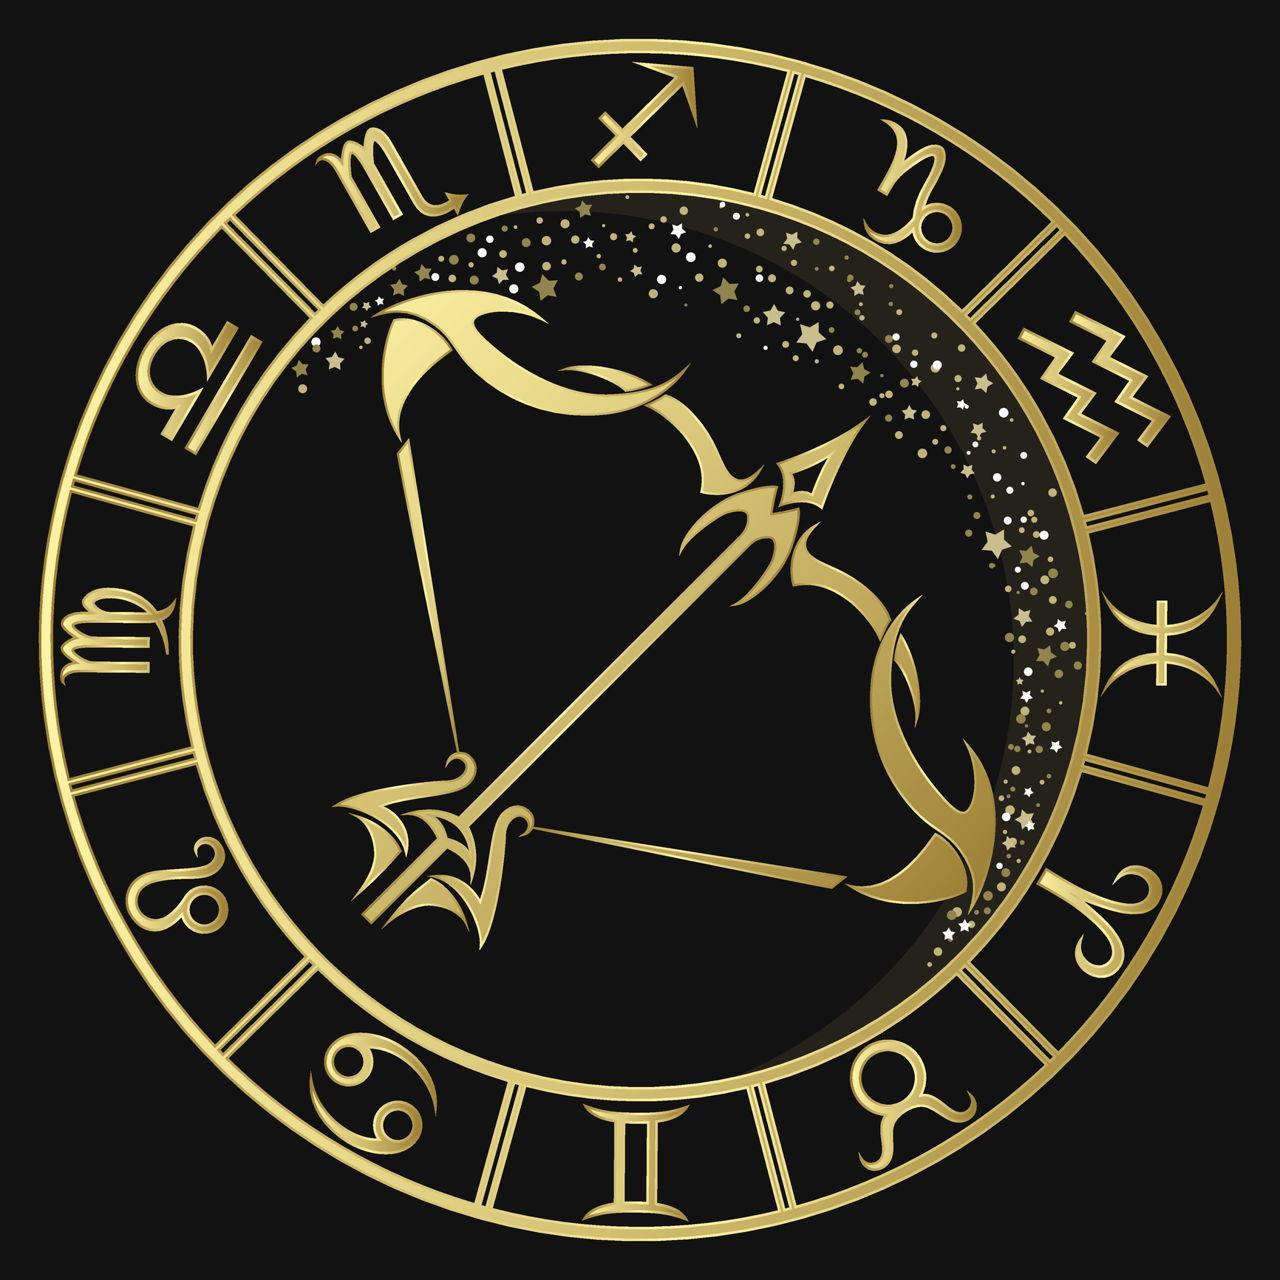 Really Distinctive Traits of a Sagittarius